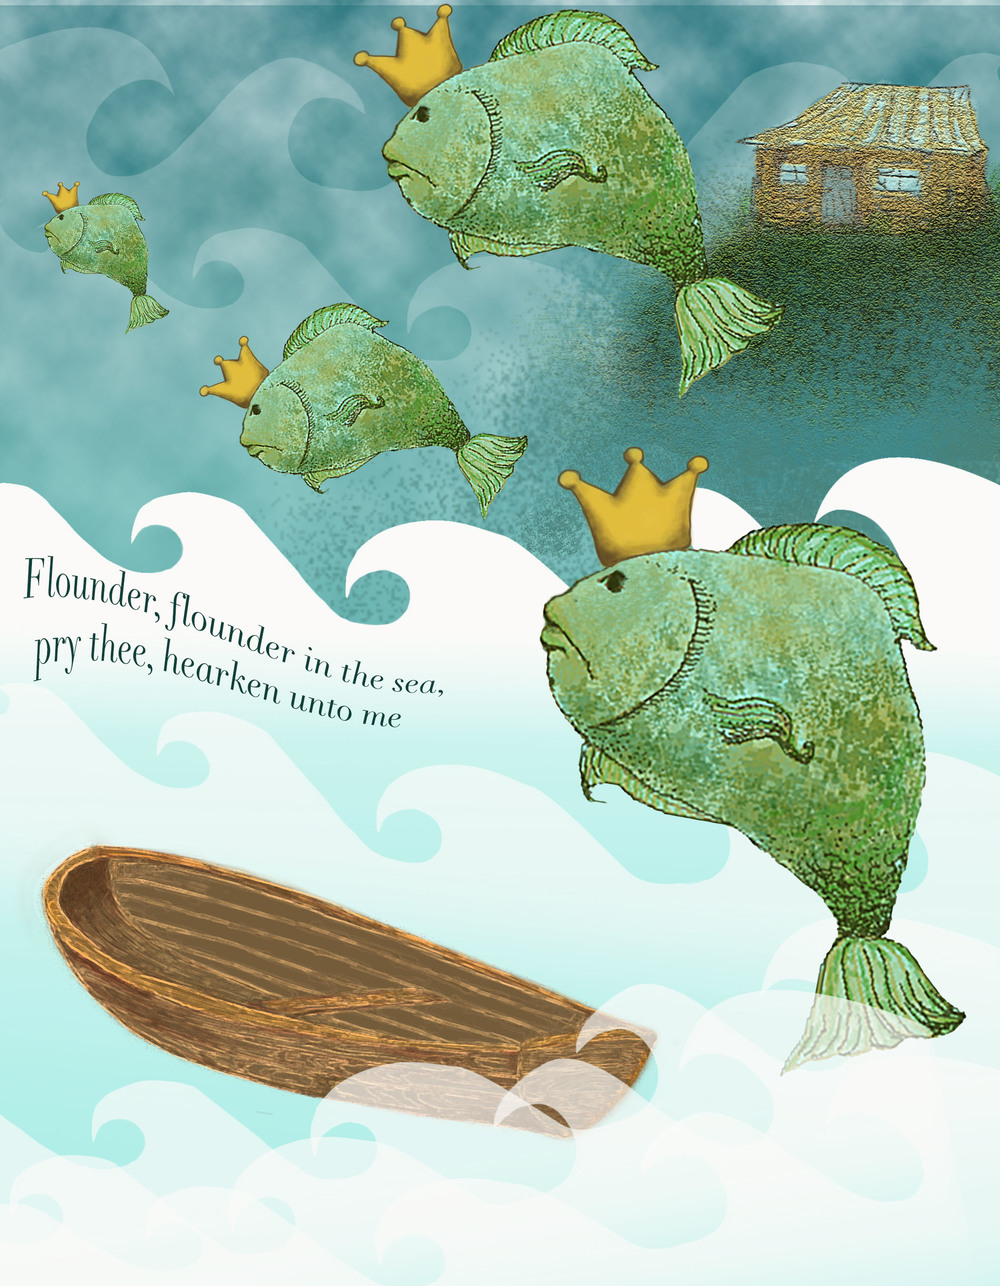 flounder-elizabeth.jpg